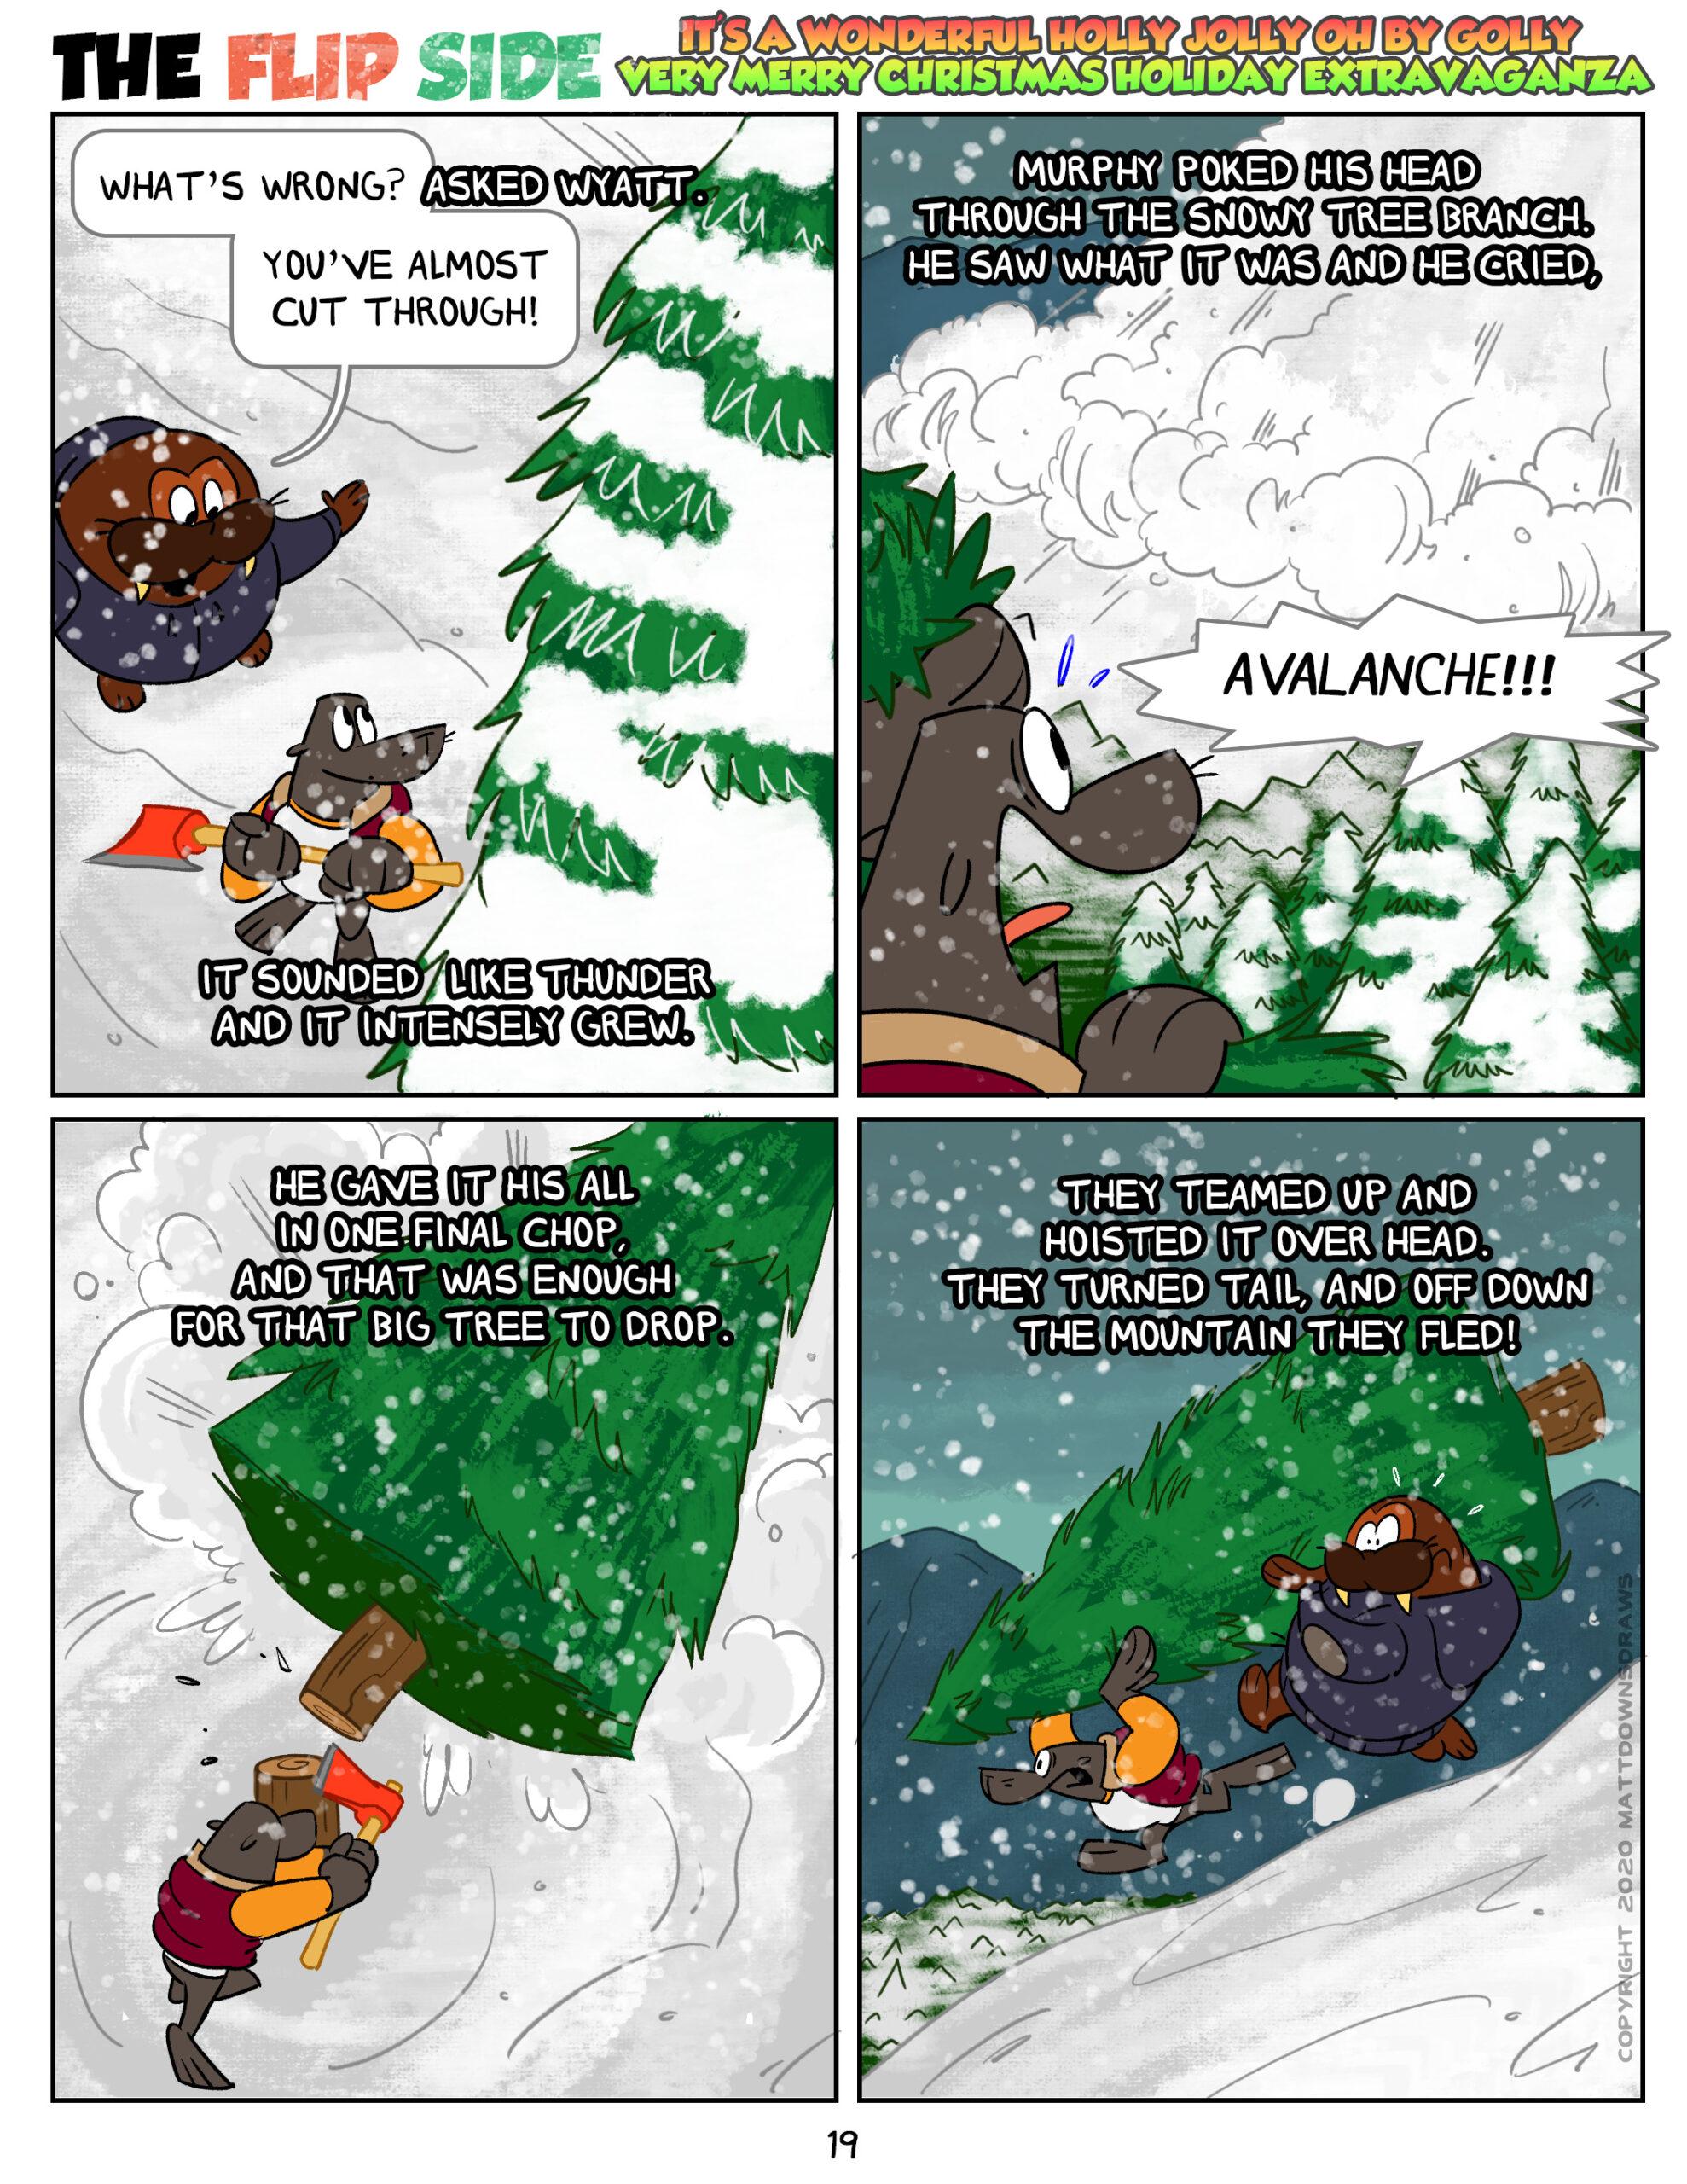 FlipSide Christmas_p_19